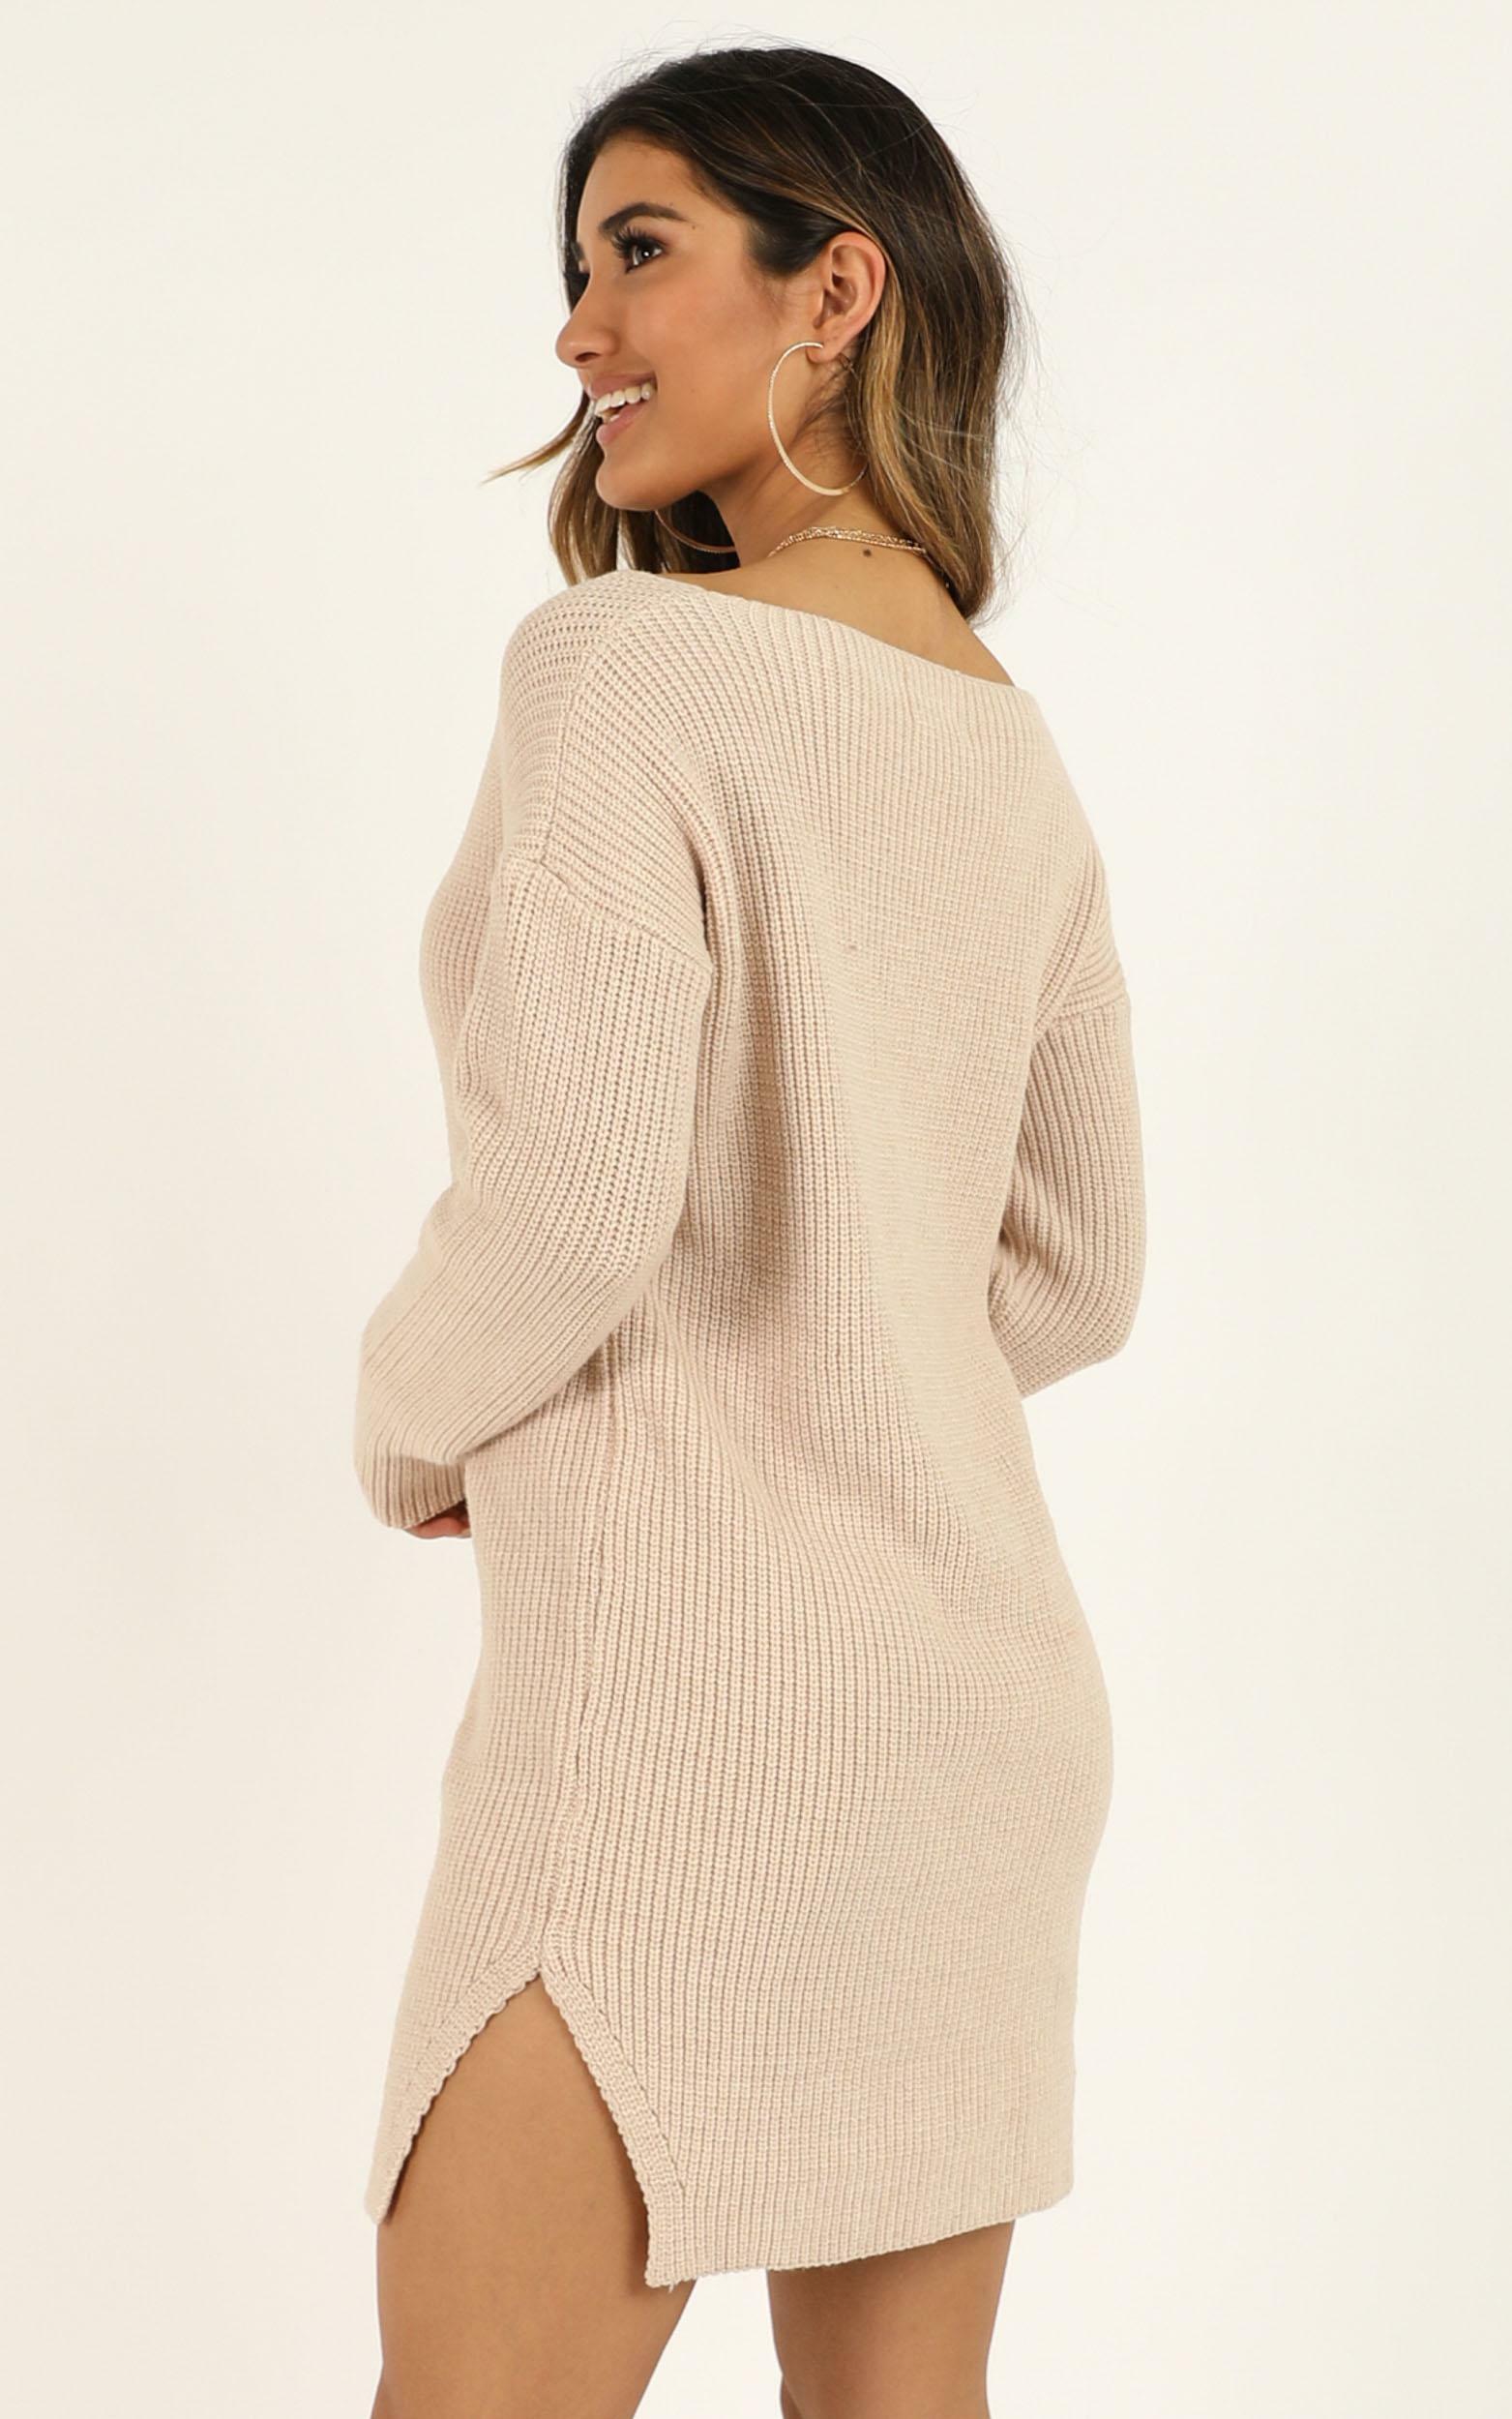 On The Floor knit dress in beige - M/L, Beige, hi-res image number null